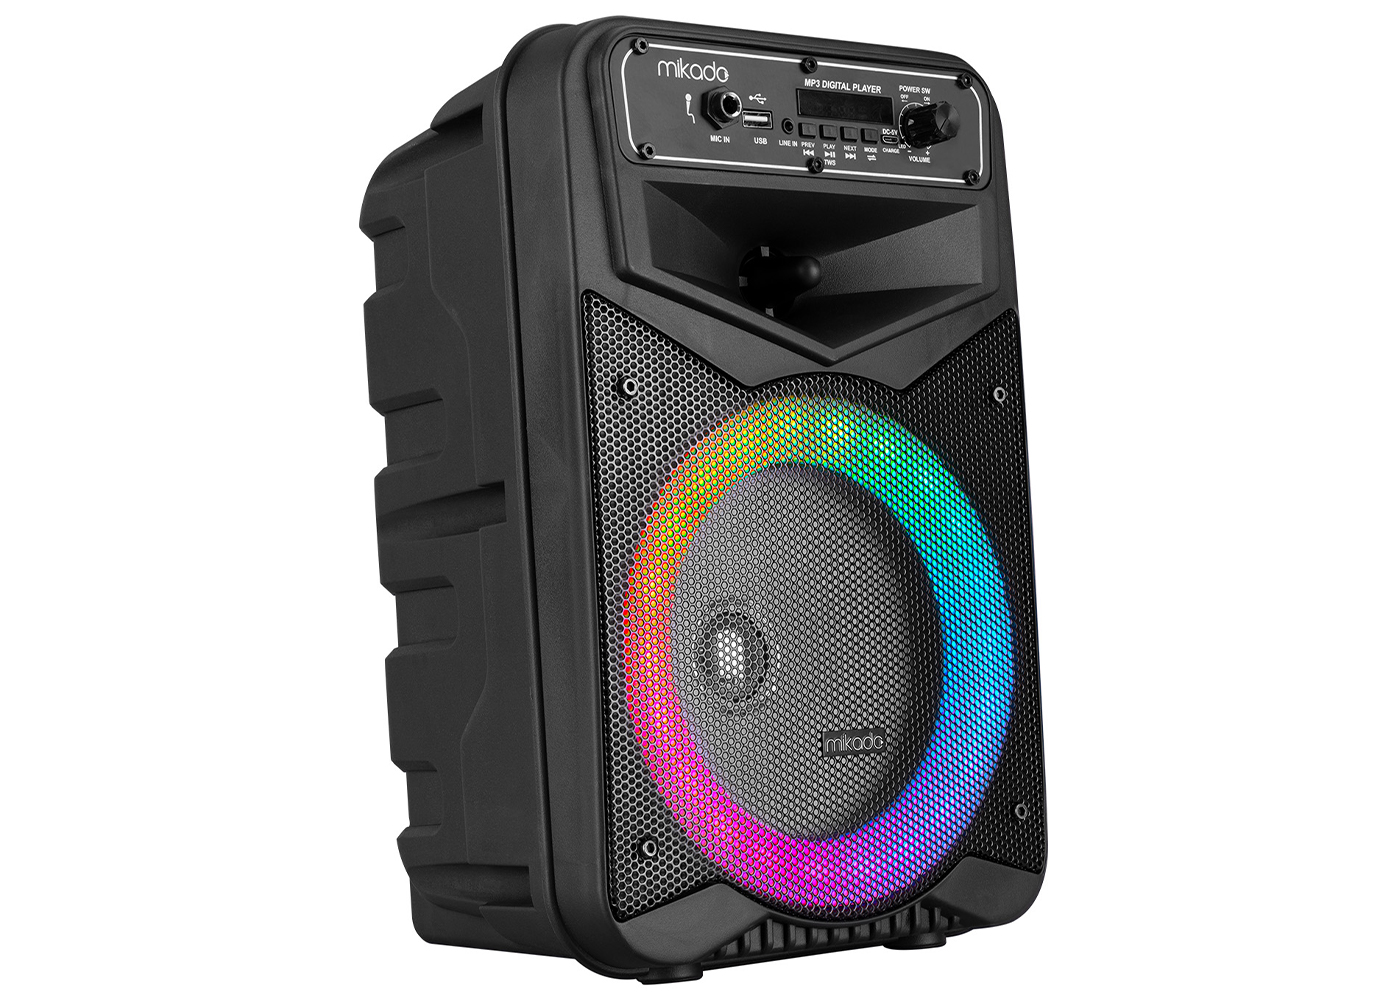 Mikado MD-802KP 3.7V 2400mAh Siyah Kablolu Mikrofon Toplantı Anfisi Bluetooth/USB/FM/RGB Ledli